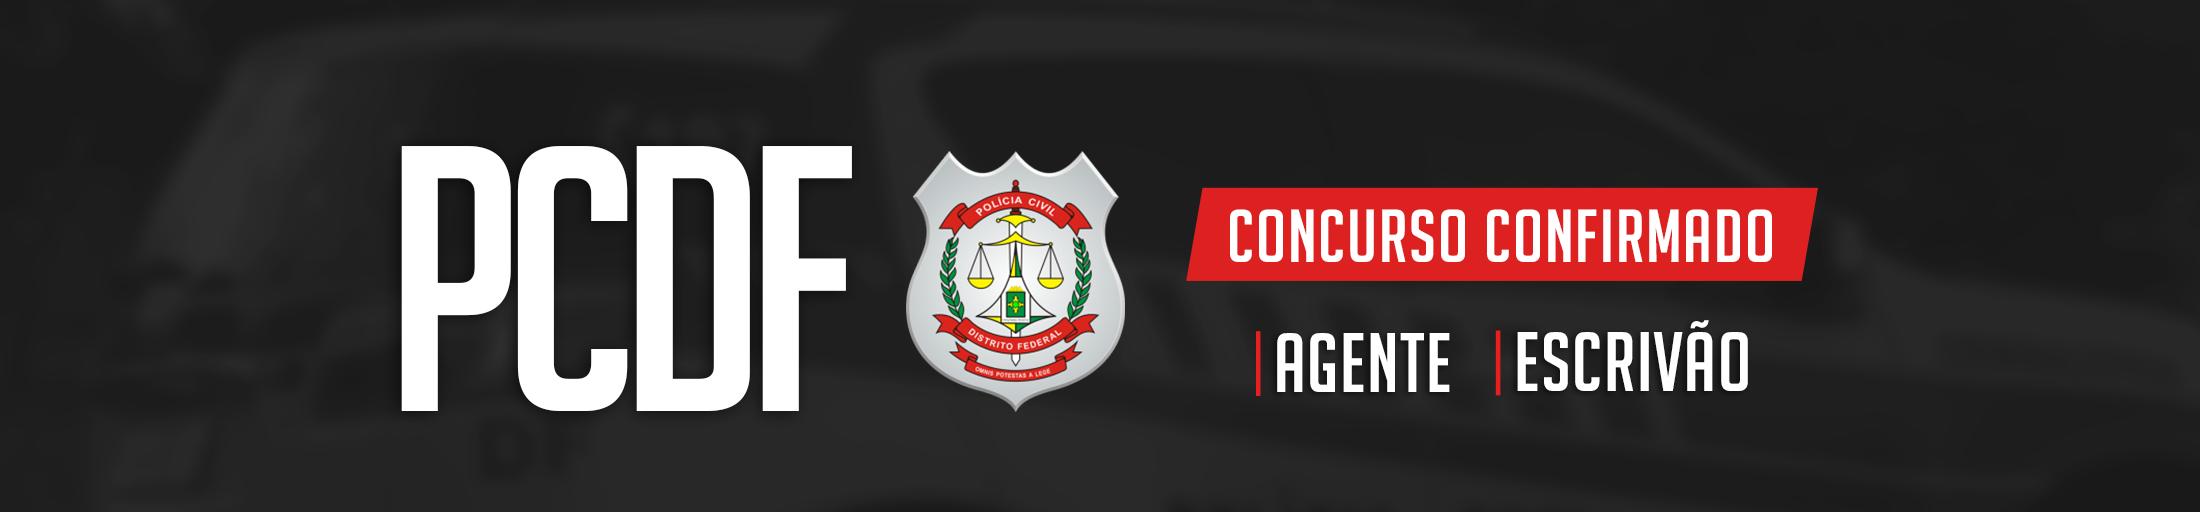 PCDF_-_CONCURSO_CONFIRMADO